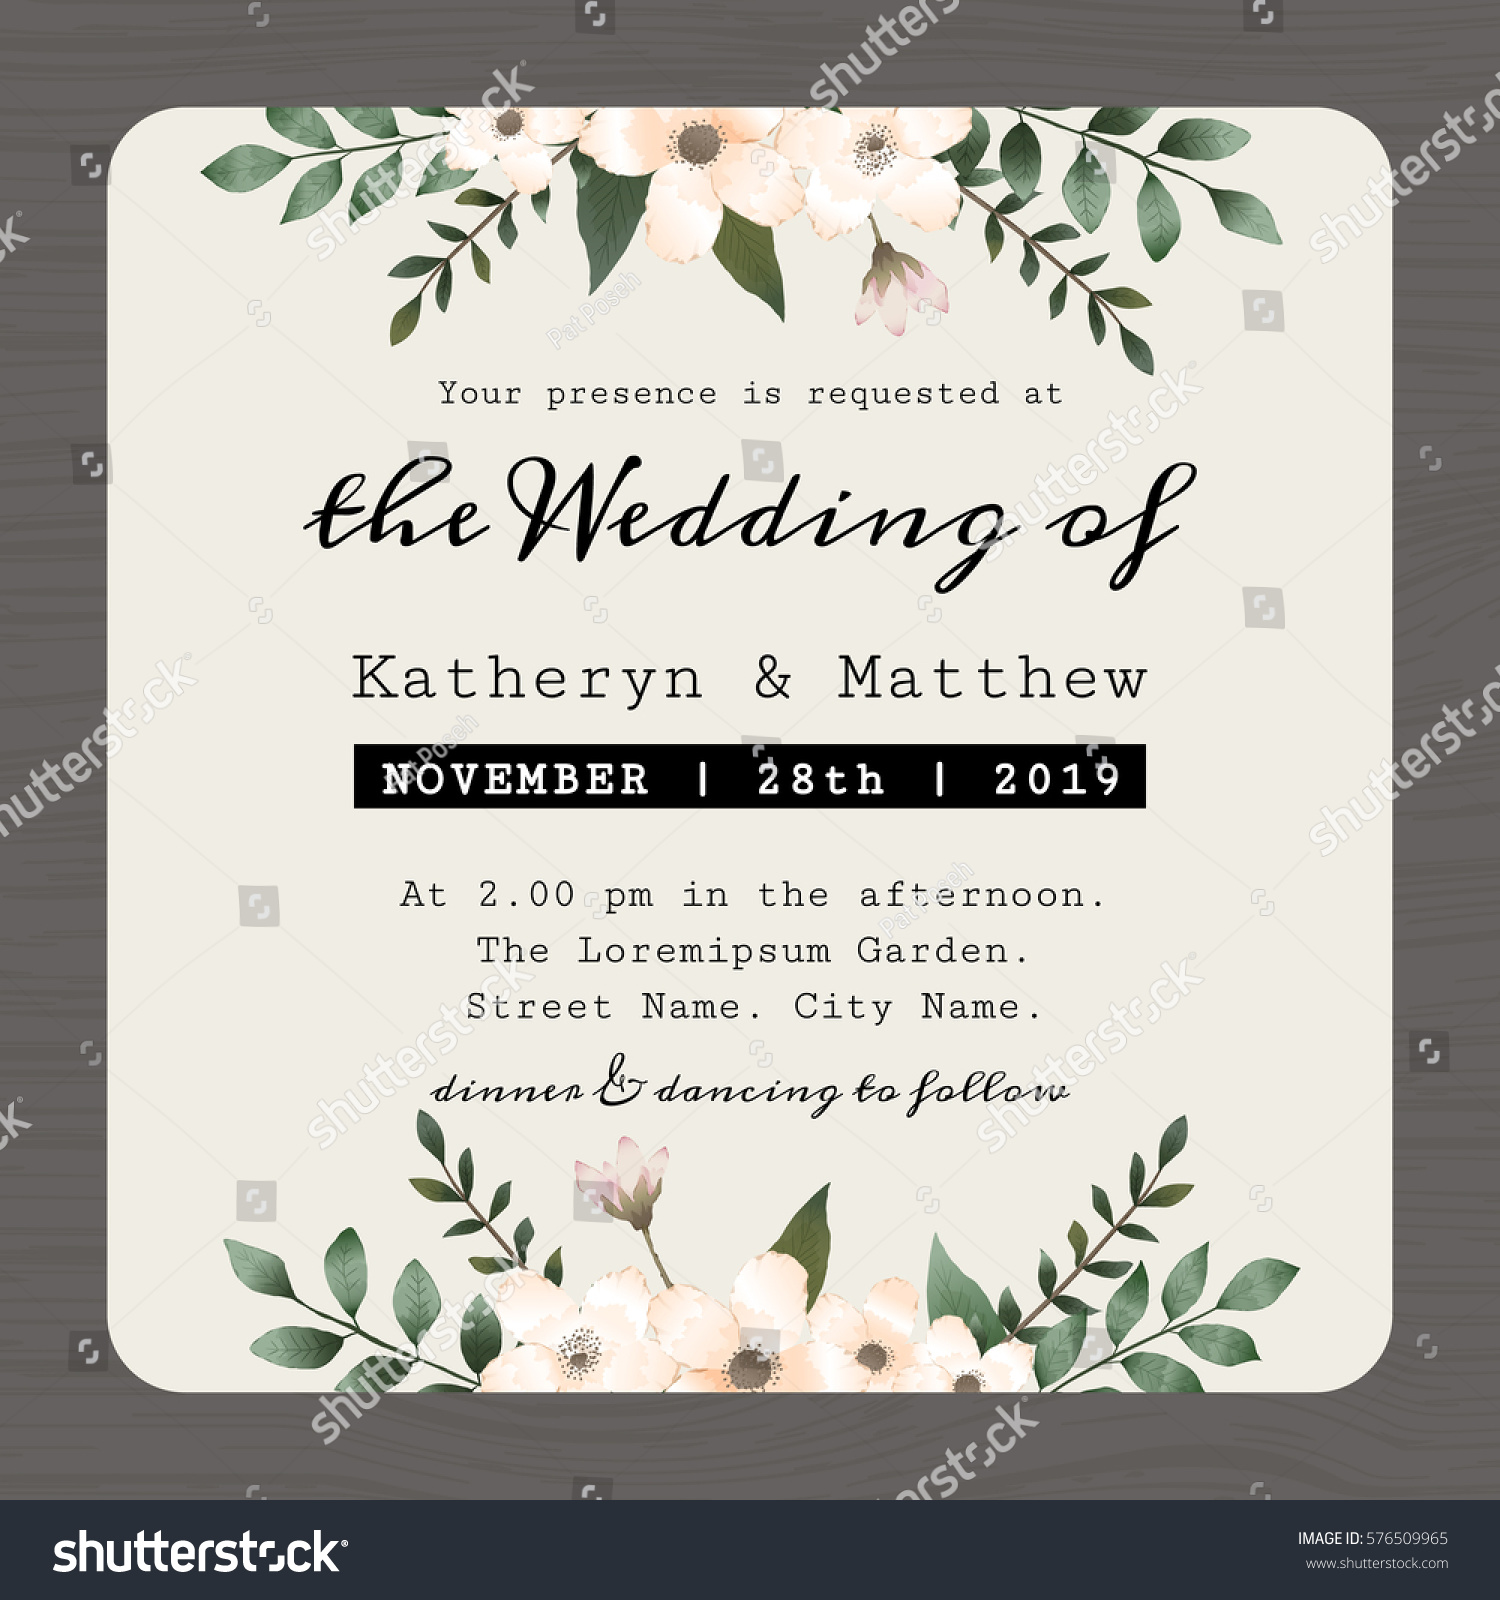 Modern Vintage Save Date Wedding Invitation Stock Vector (Royalty ...